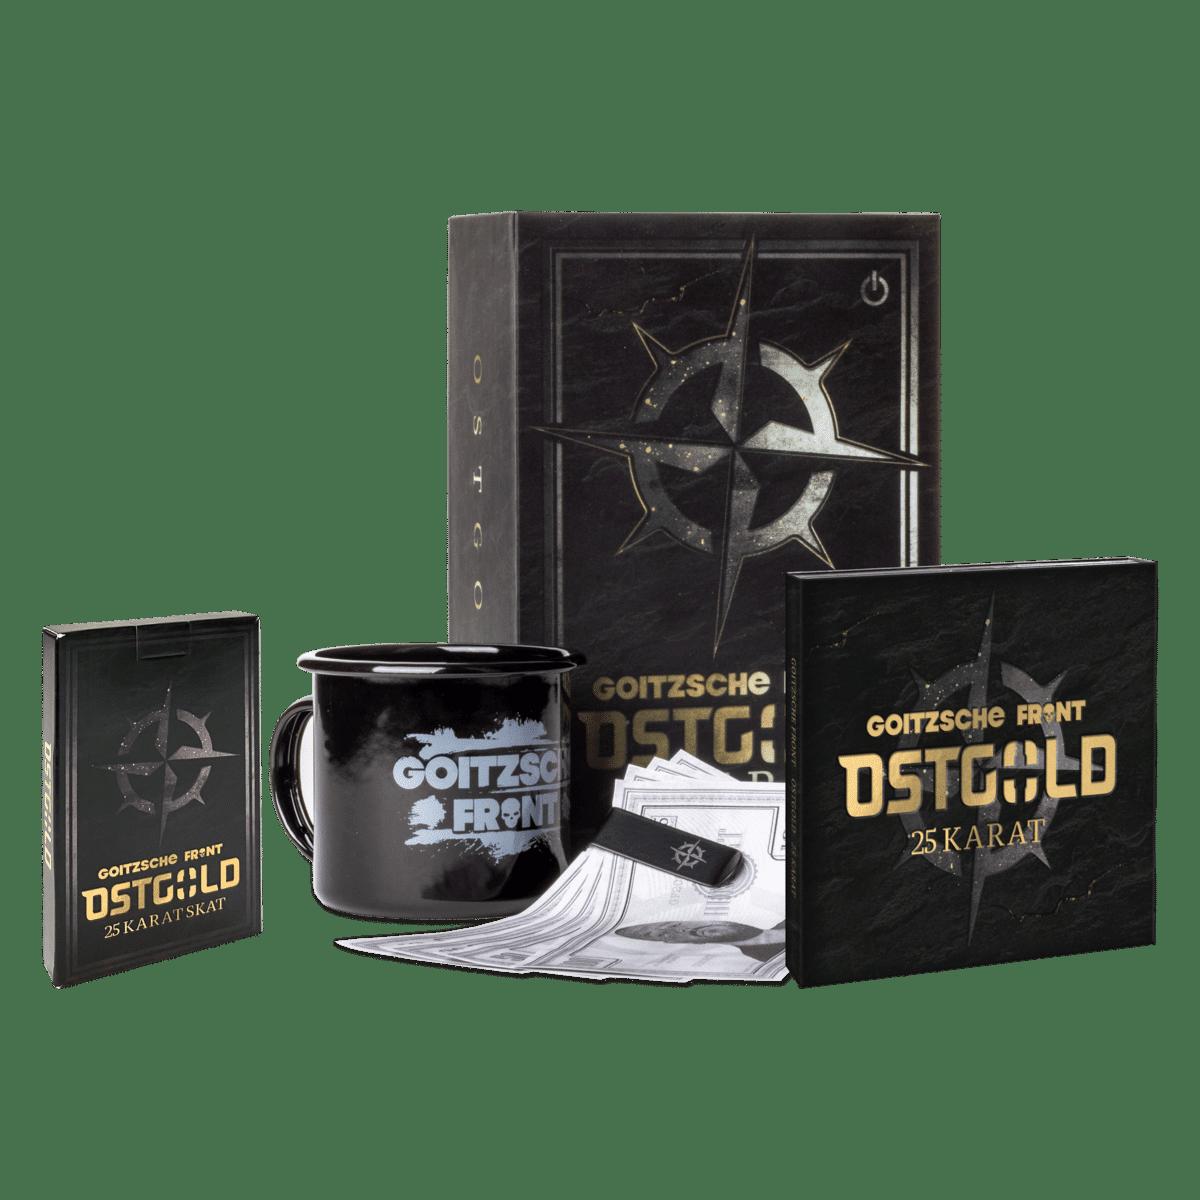 Ostgold 25Karat Ltd. Edition